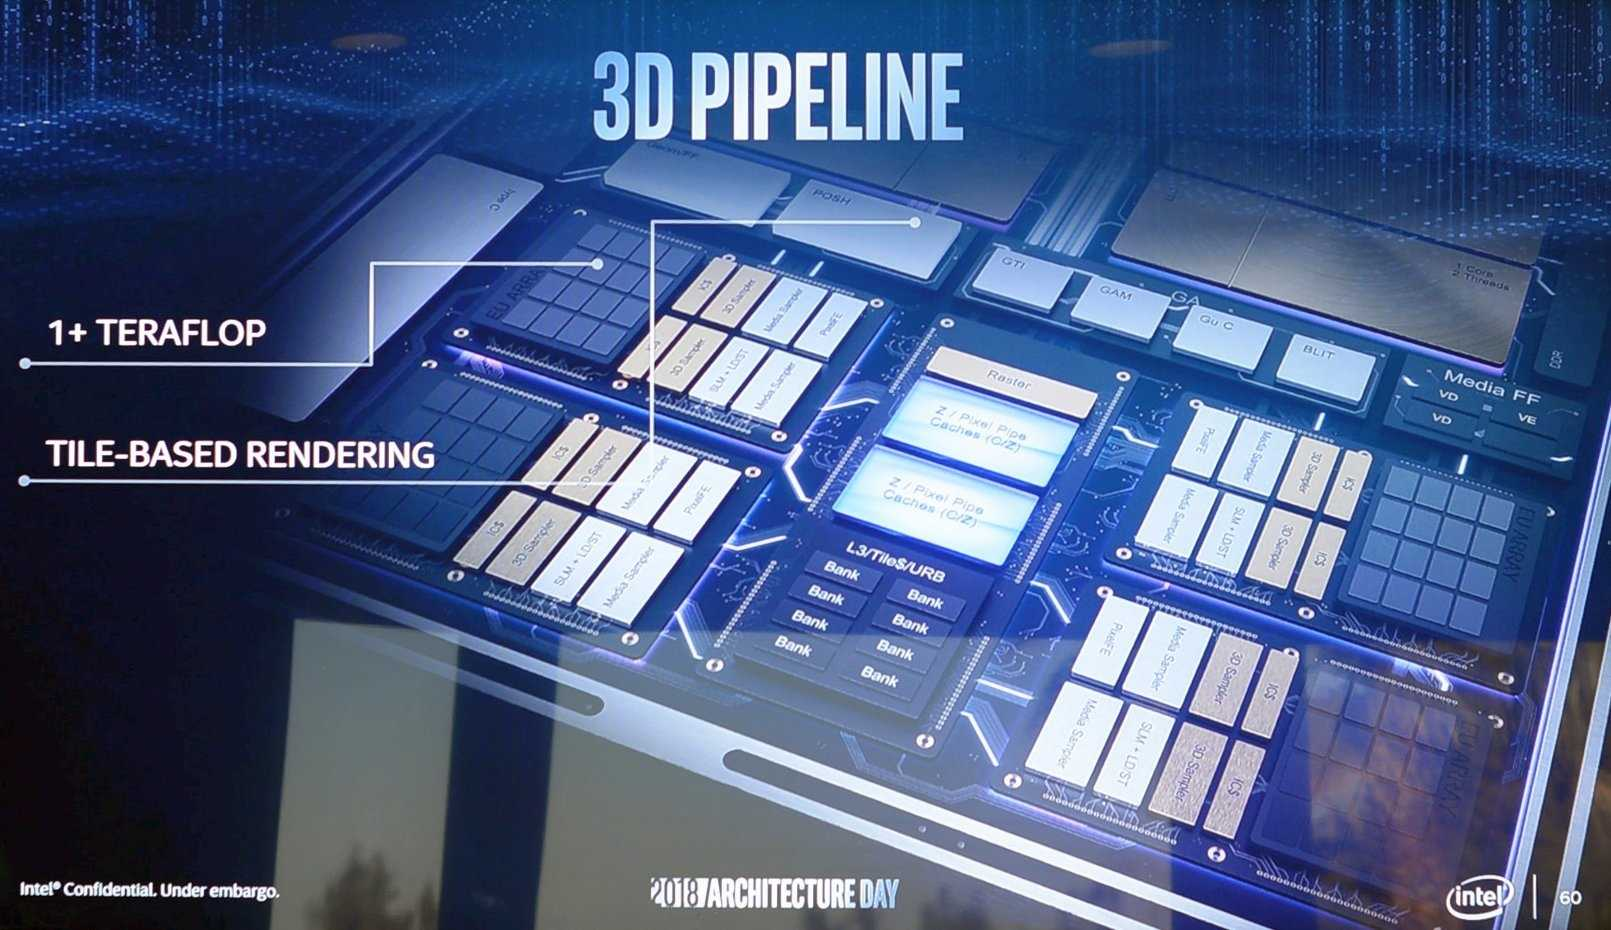 Intels 11. Generation integrierter Grafikprozessoren (Gen 11 IGP) soll 1 TFlops Rechenleistung schaffen.